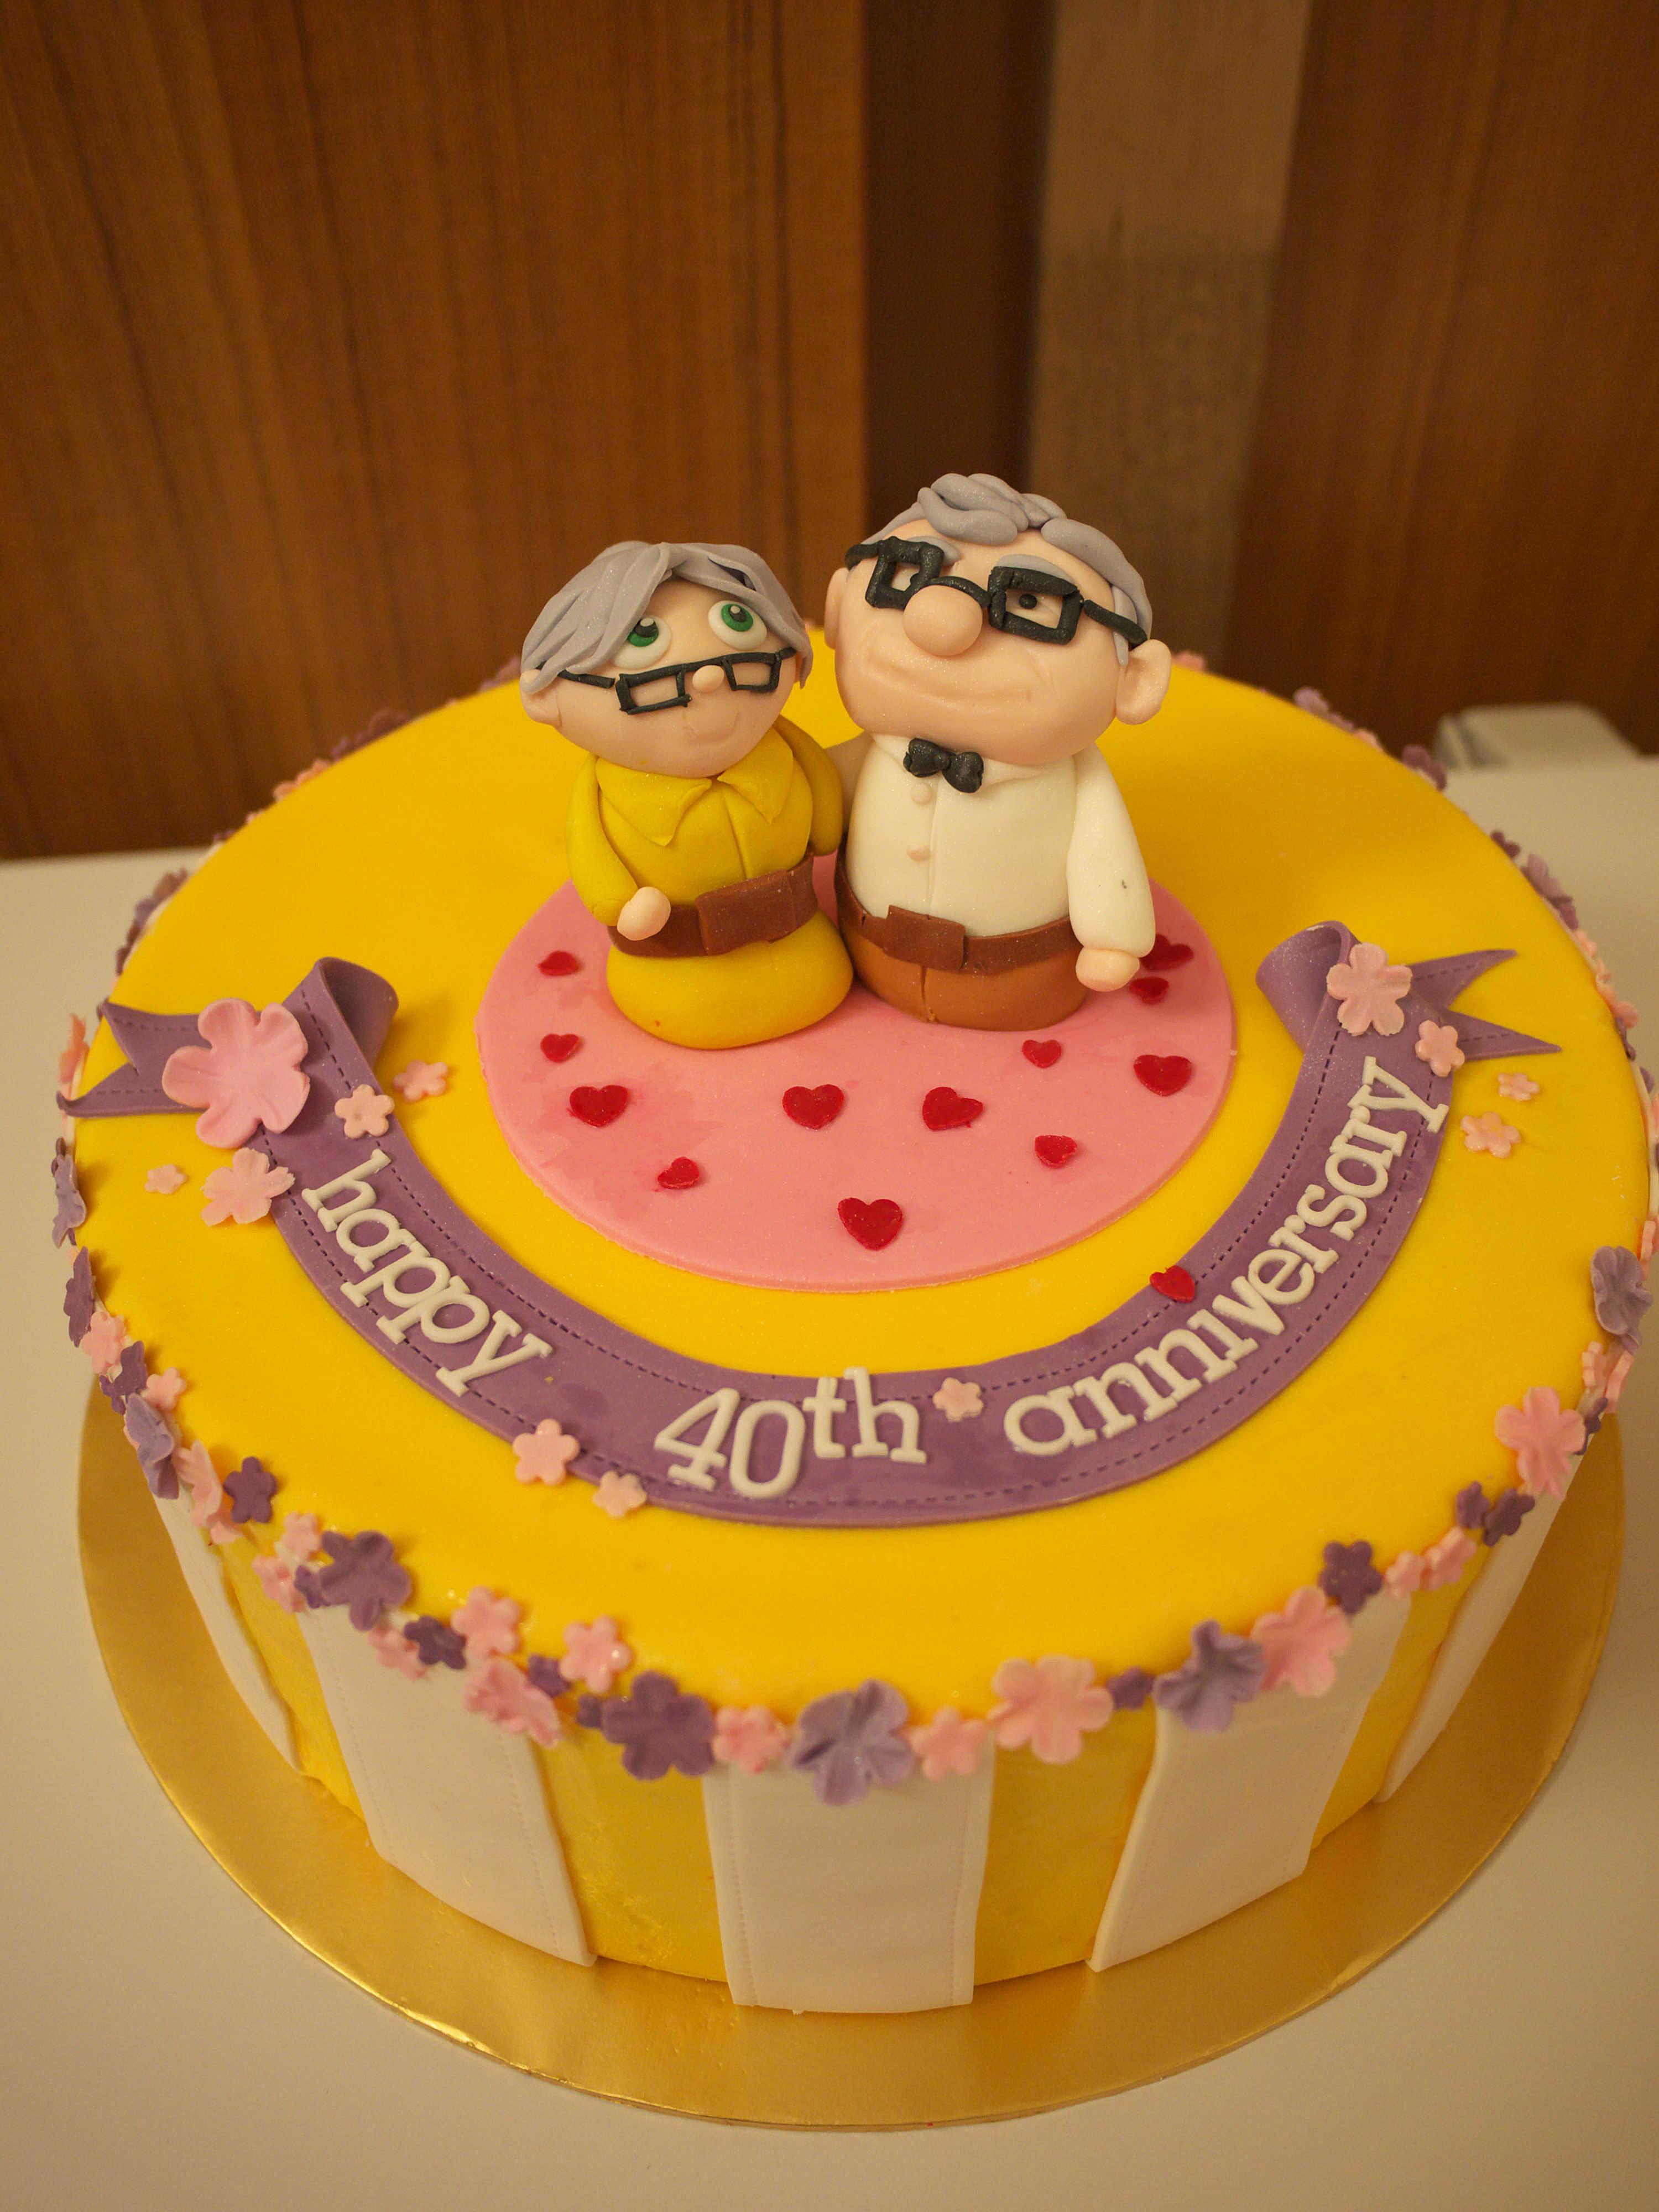 Xiao By Crustz Grandpa Grandma Cake